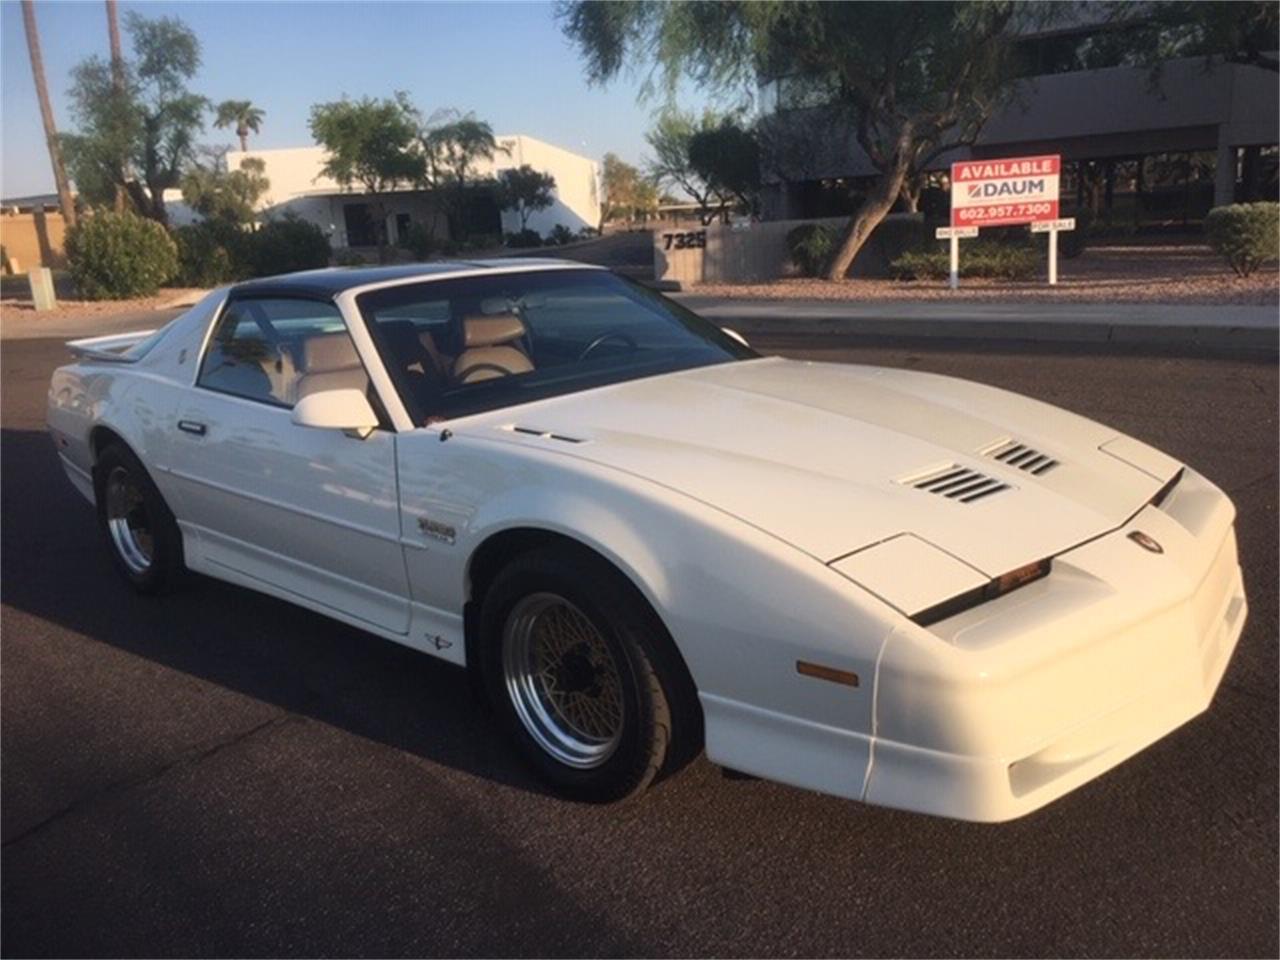 1989 Pontiac Firebird Trans Am Turbo Indy Pace Car Edition (CC-1388428) for sale in Scottsdale, Arizona